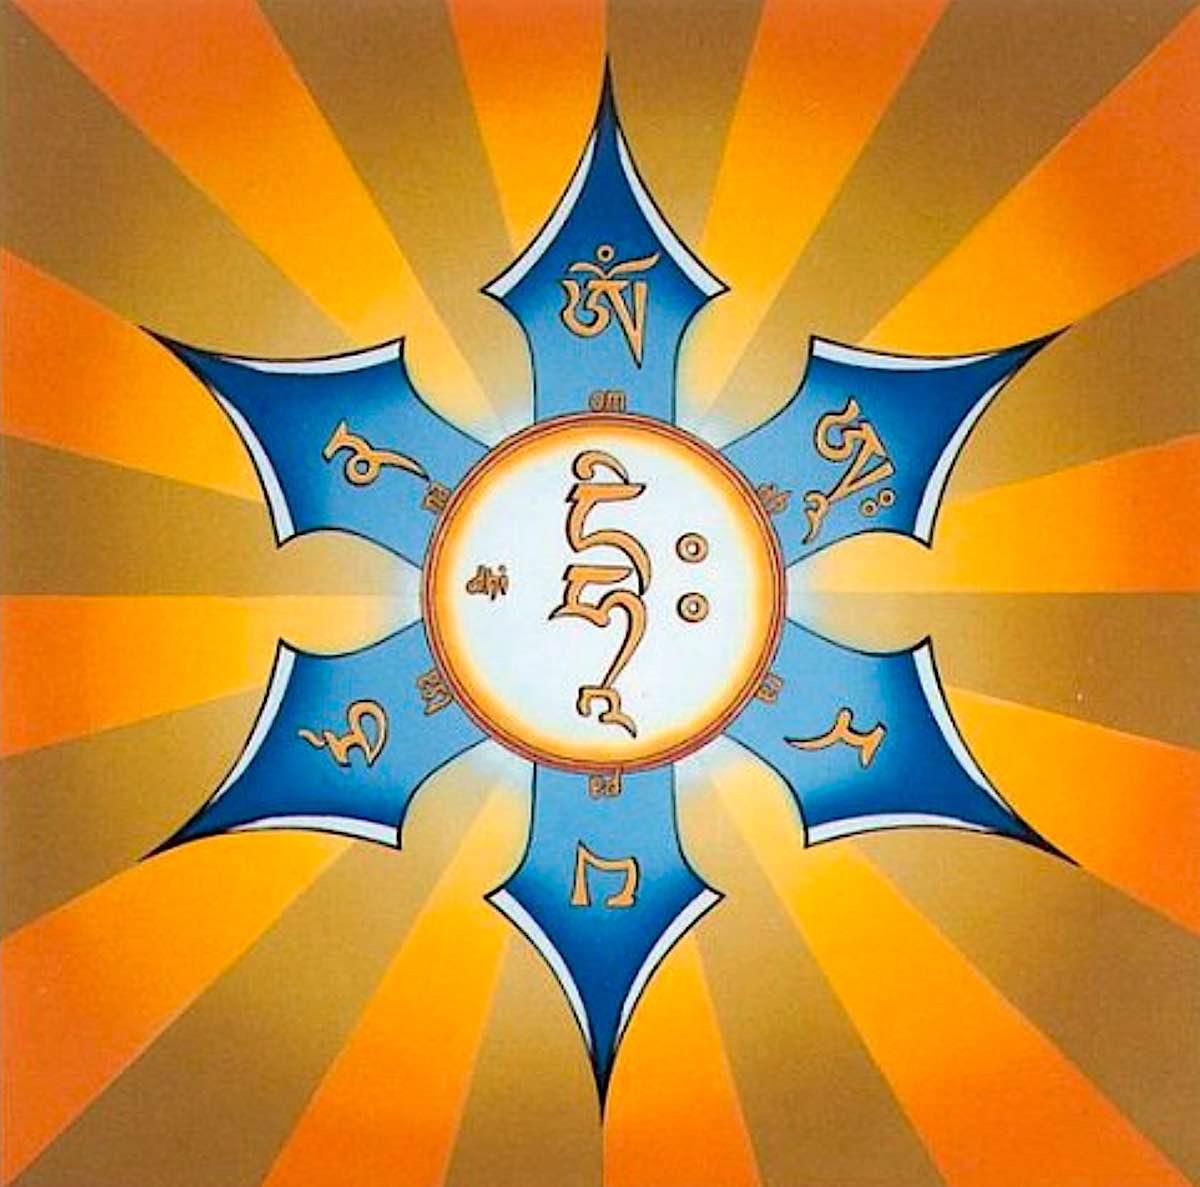 Buddha Weekly Manjushiri mantra surrounding DHI syllable visualization Buddhism